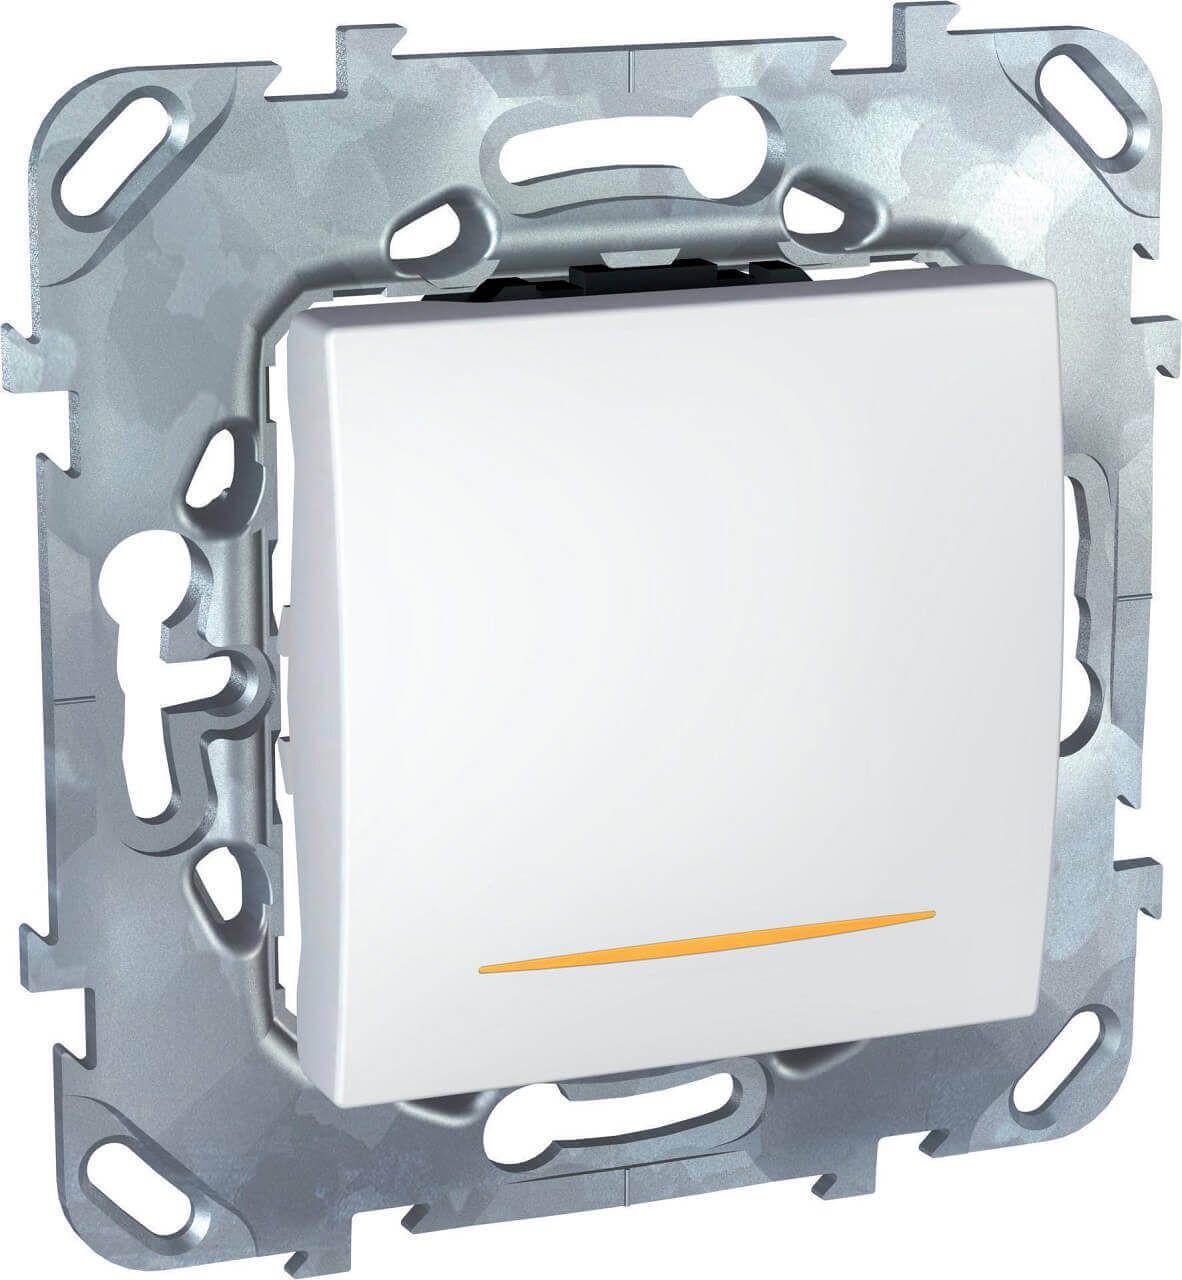 Выключатель Schneider Electric MGU5.262.18SZD Unica (Подходит под рамки Unica, Хамелеон, Quadro)